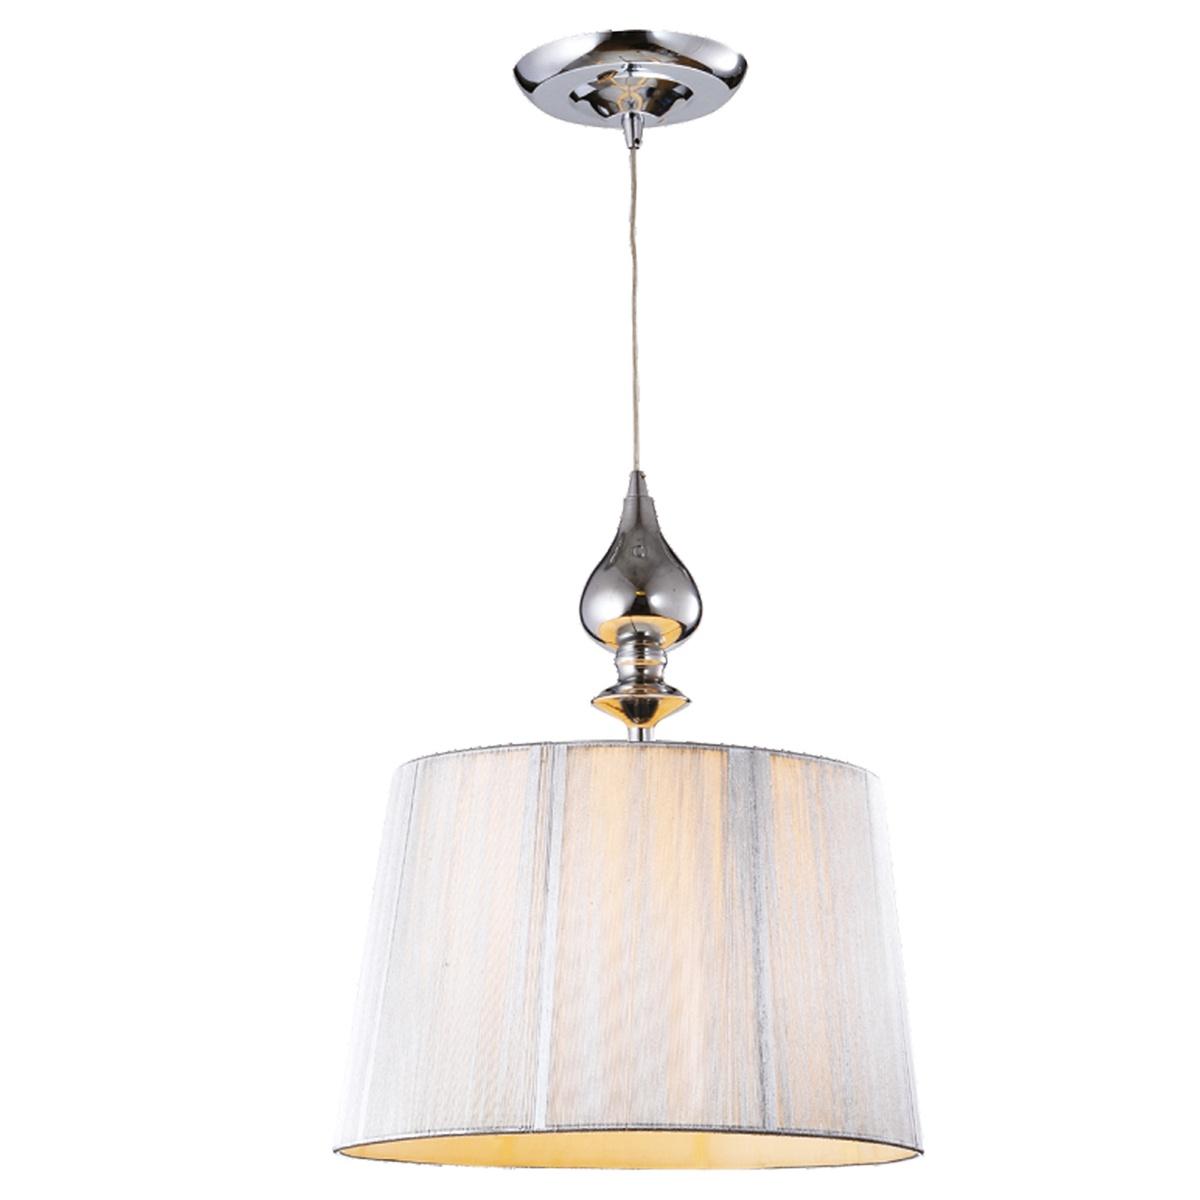 Подвесной светильник Collezioni Ely Silver, E27, 1x60Вт Вт цены онлайн